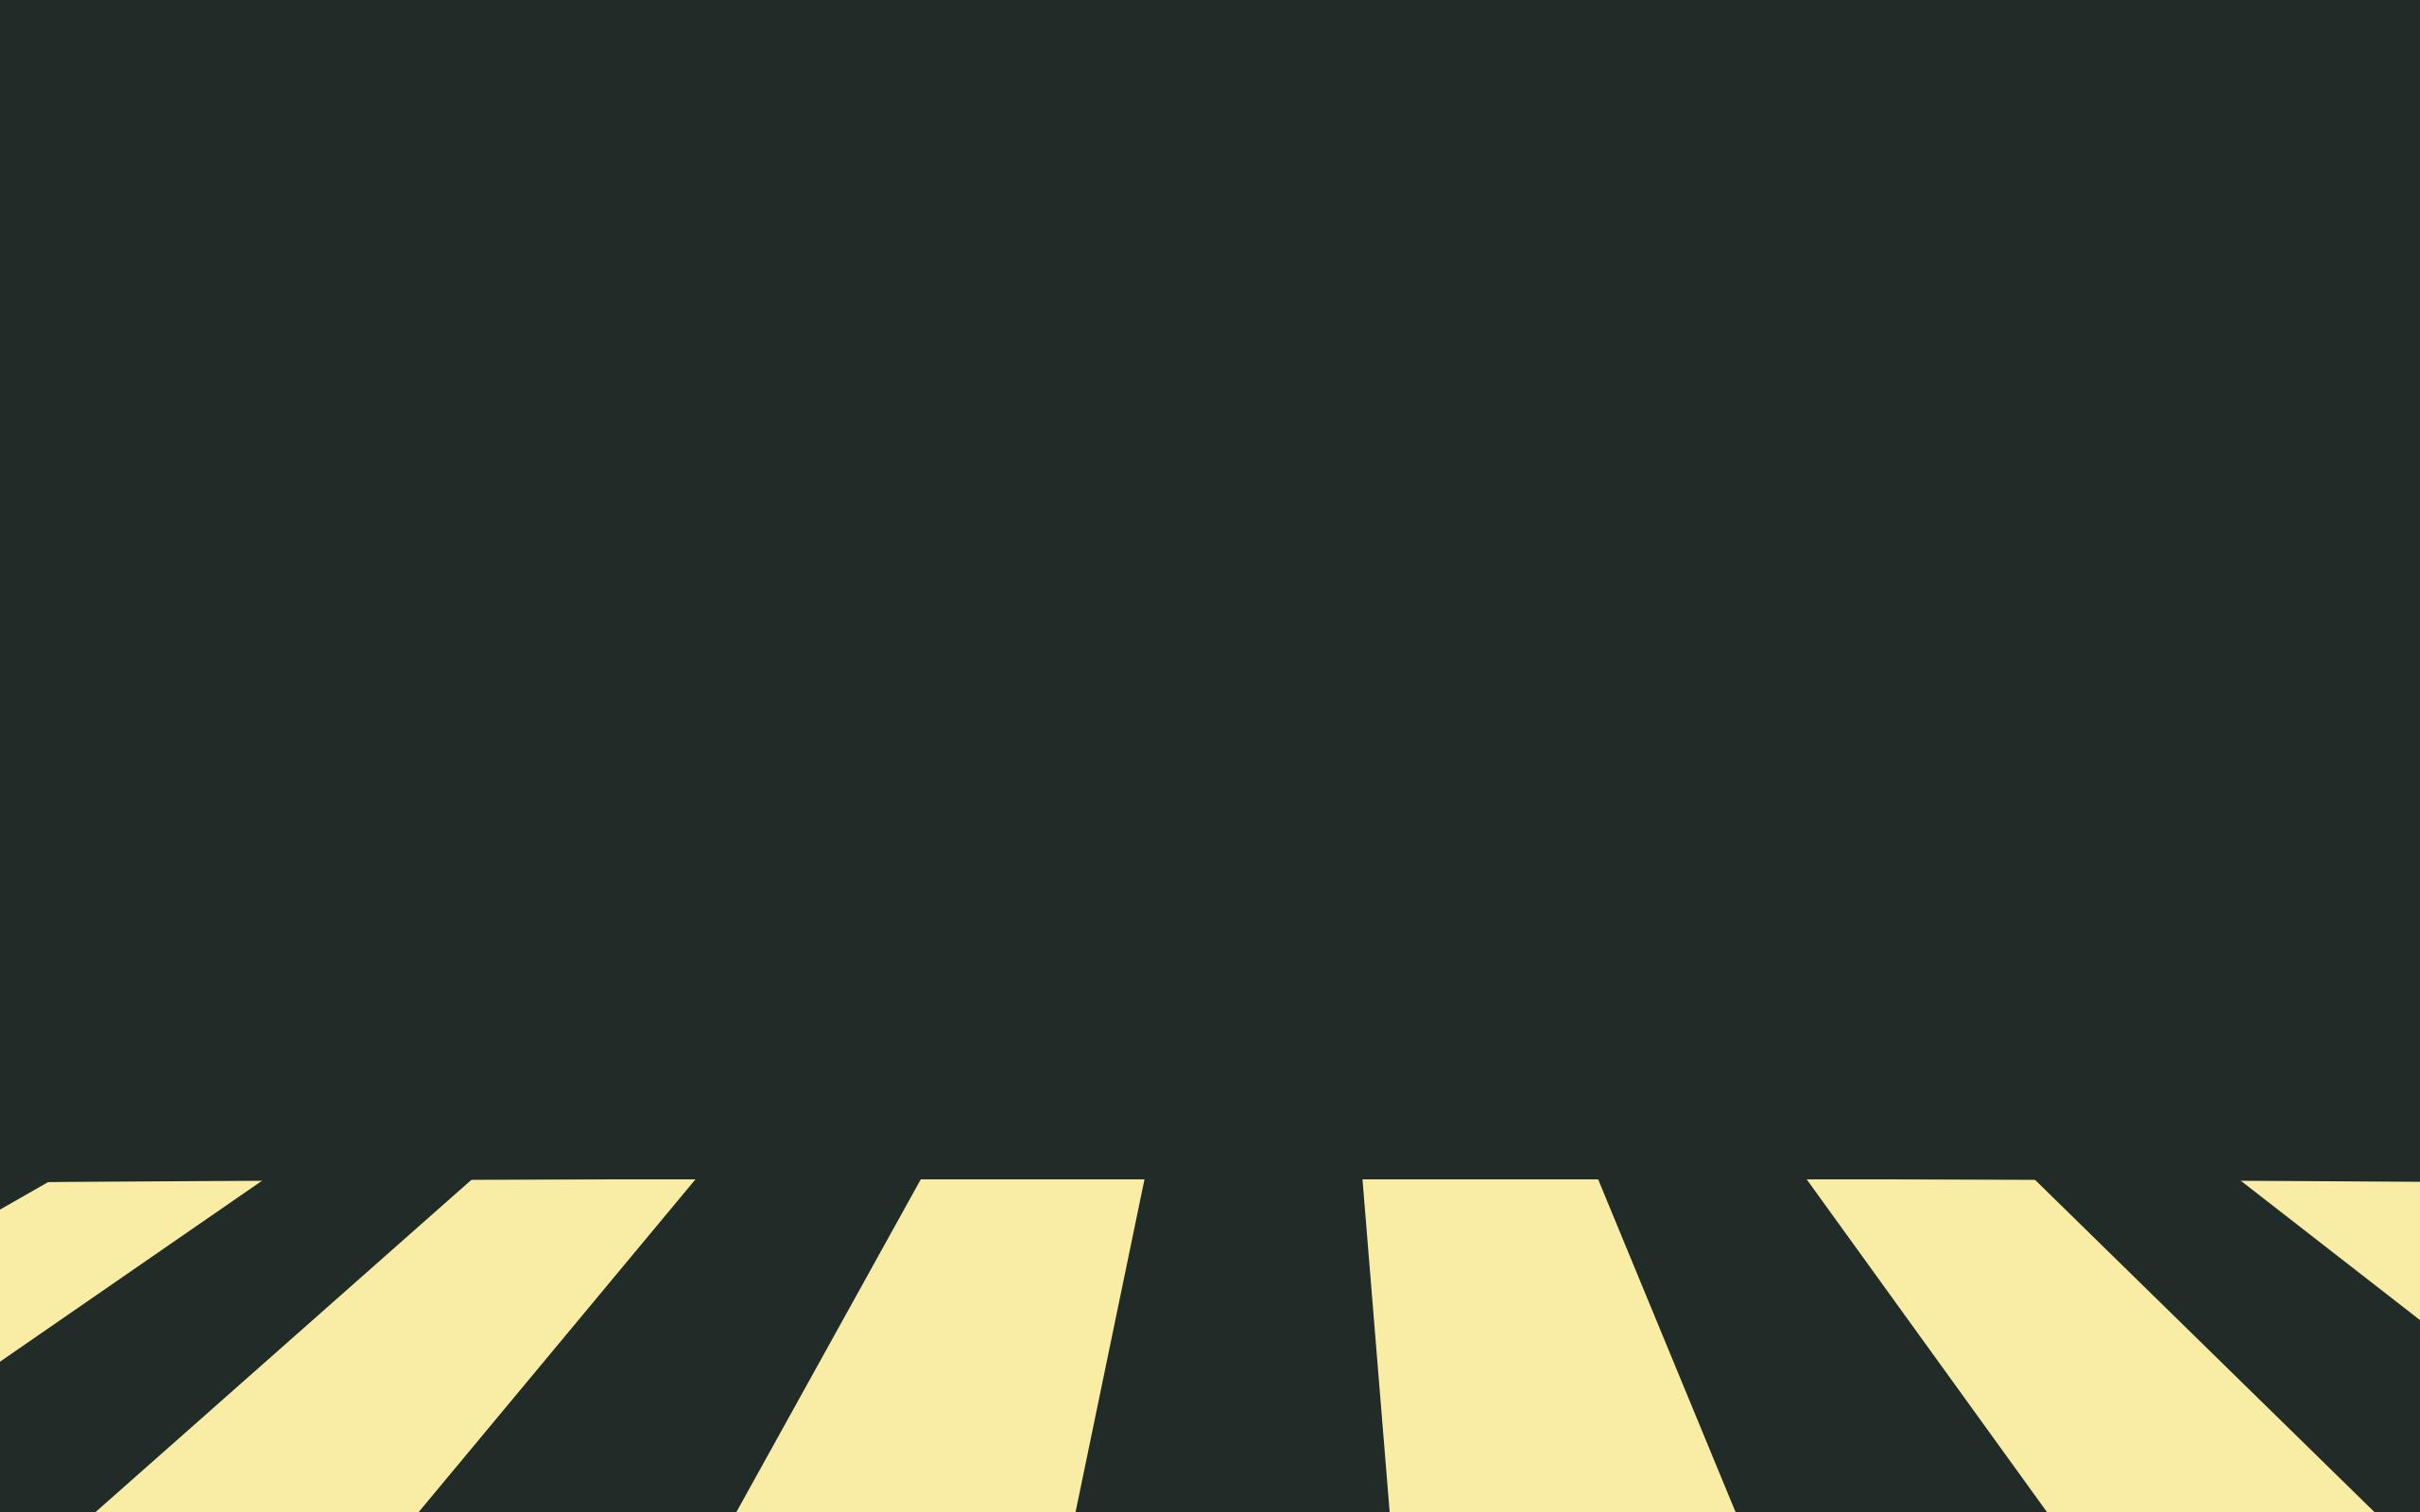 candy-minimalist-55774.jpg